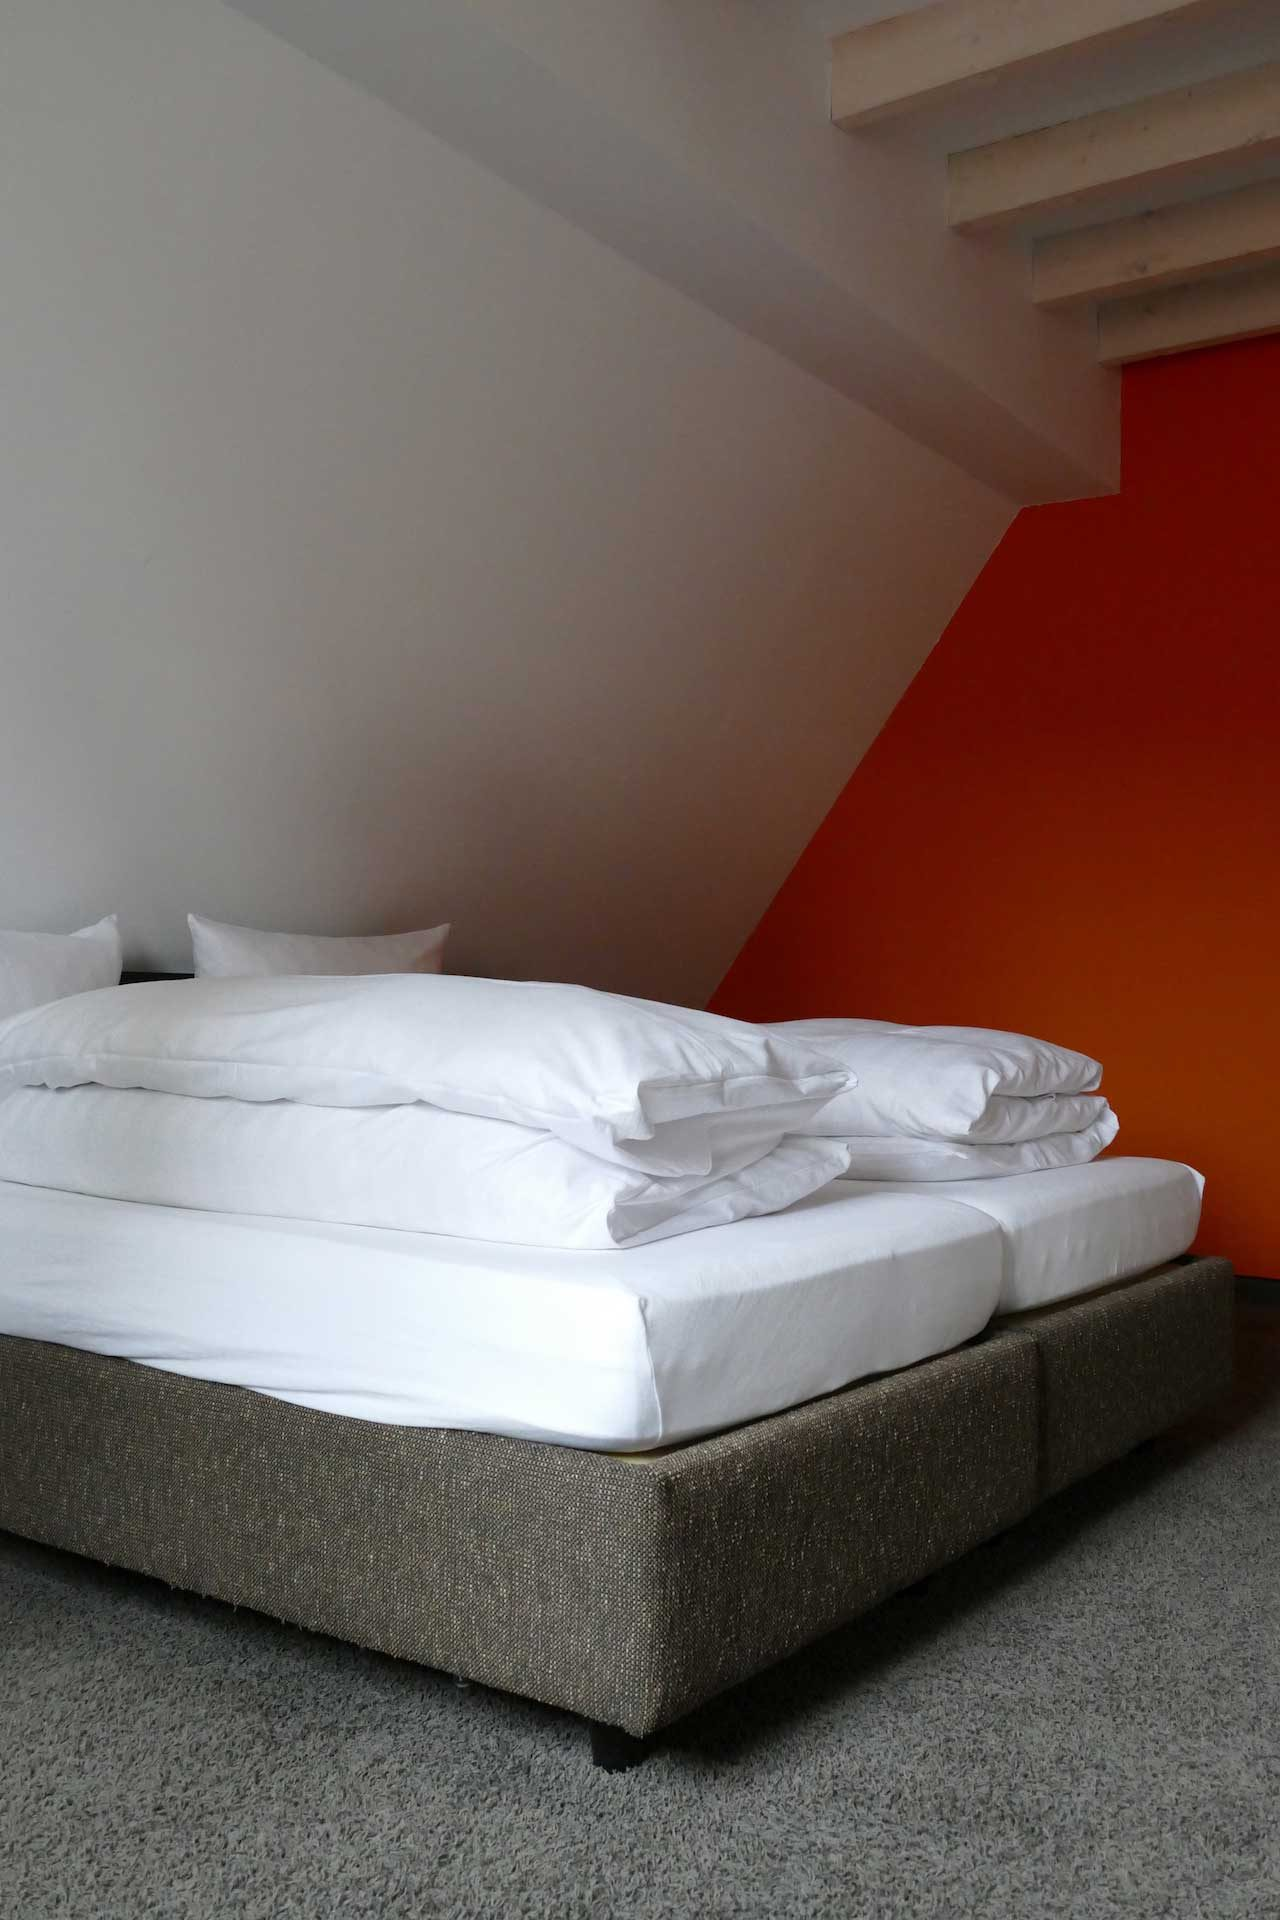 Gästehaus maximilian in Speyer